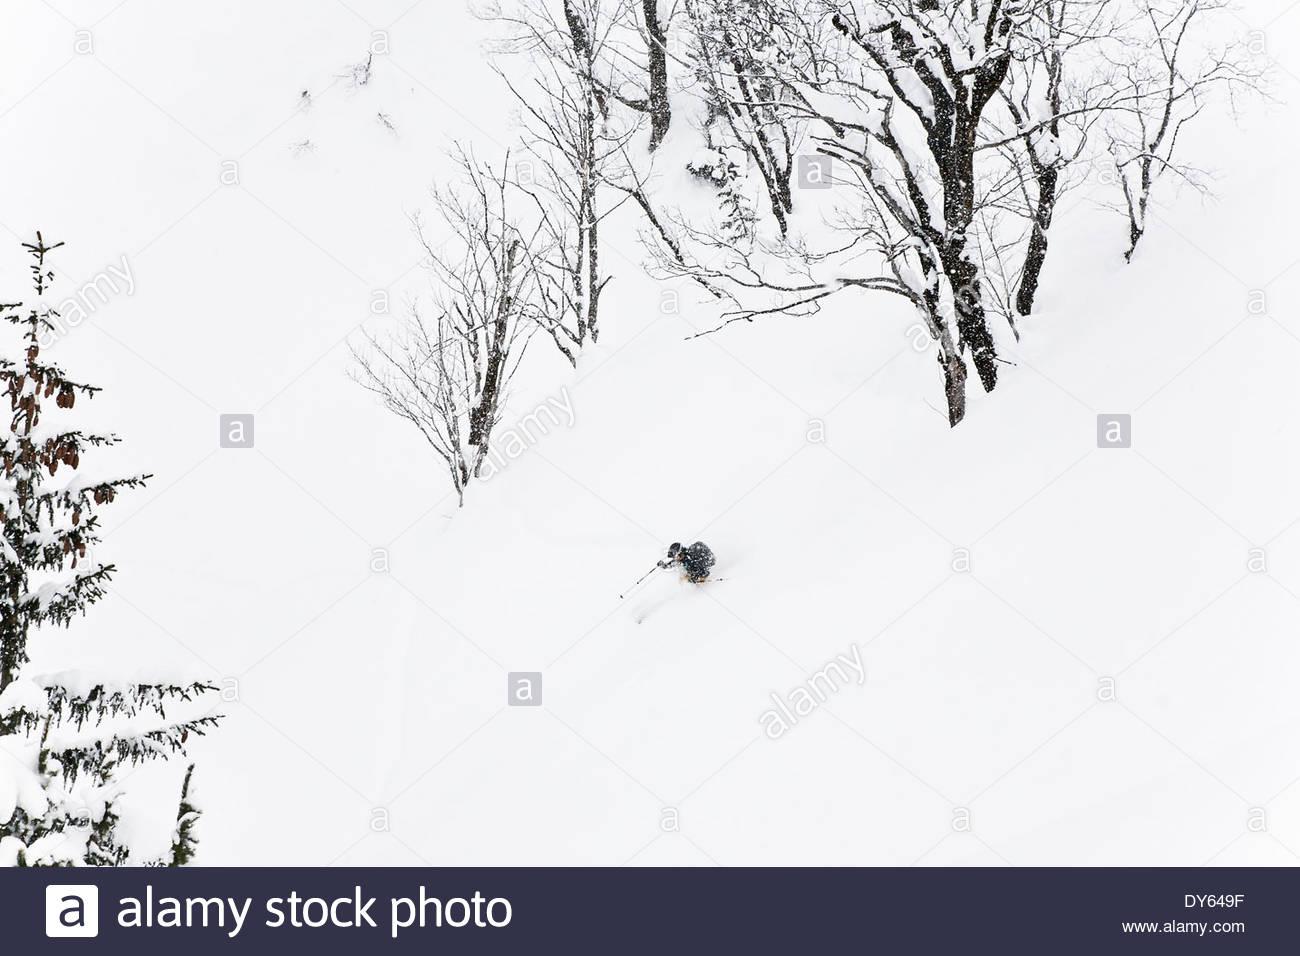 Man downhill skiing, Laliderer Scharte, Risstal, Tyrol, Austria Stock Photo